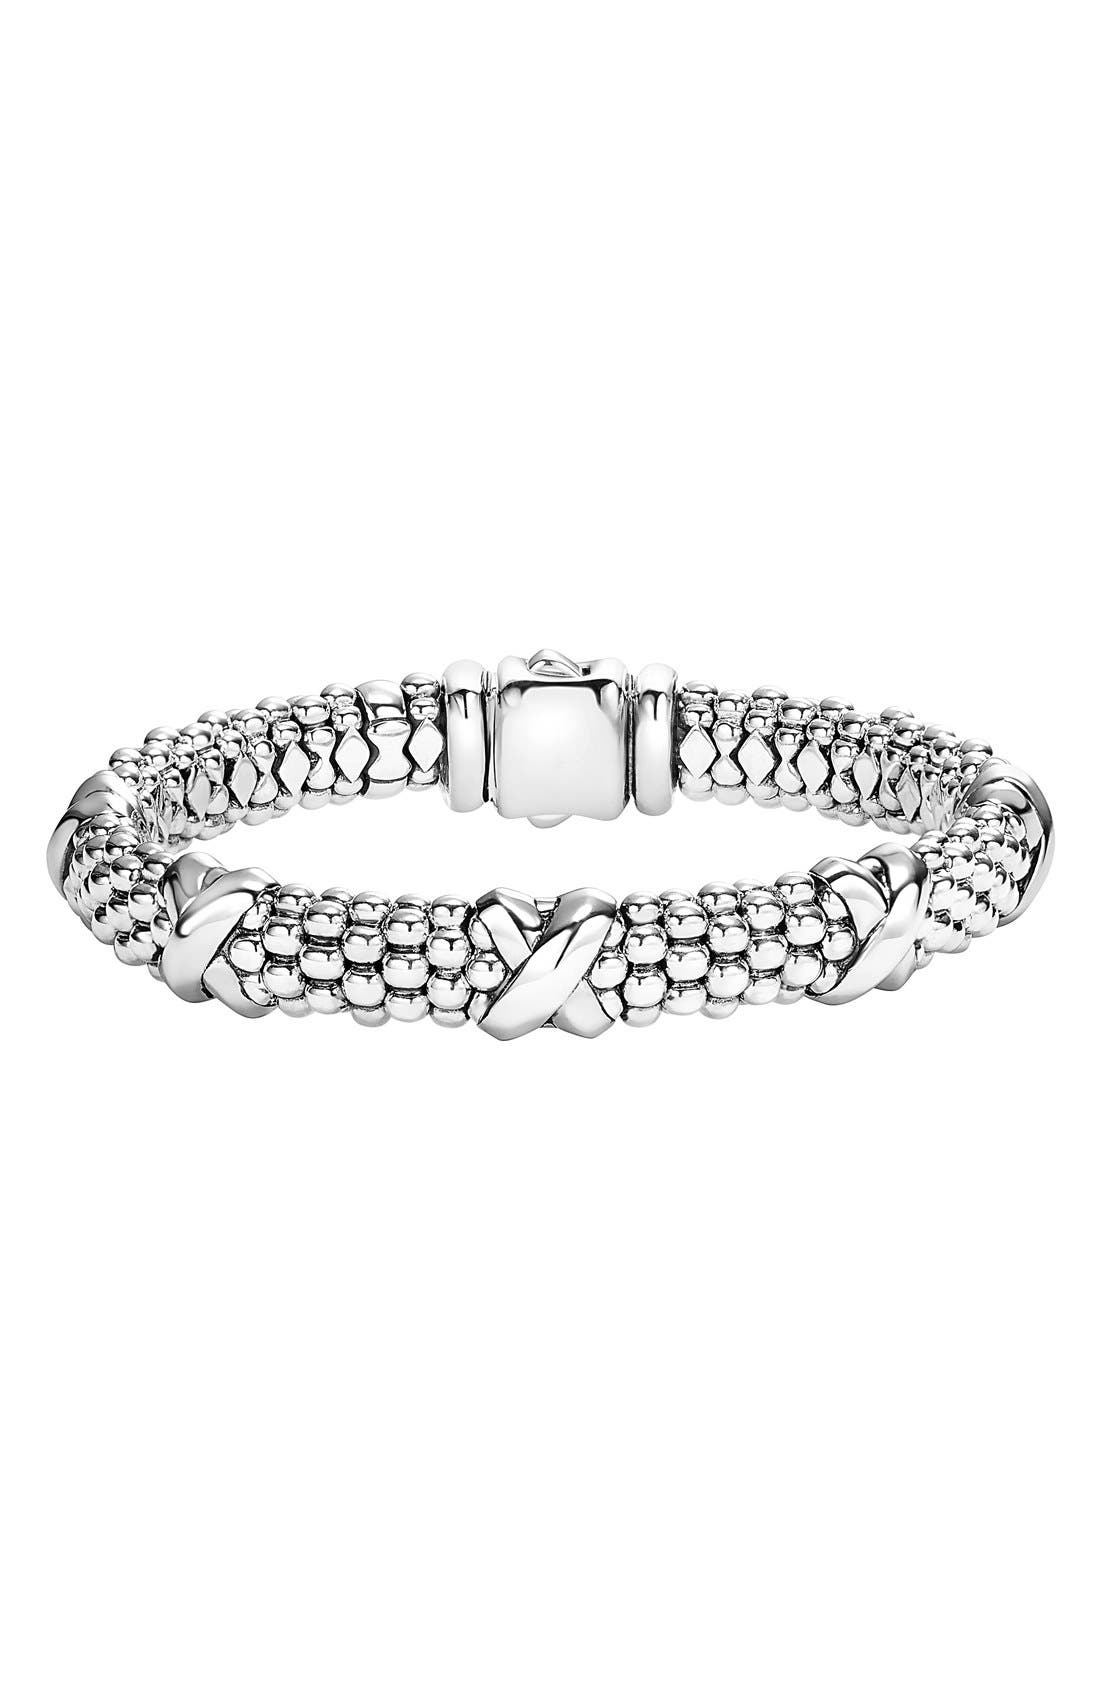 Main Image - LAGOS 'Signature Caviar' Oval Rope Bracelet